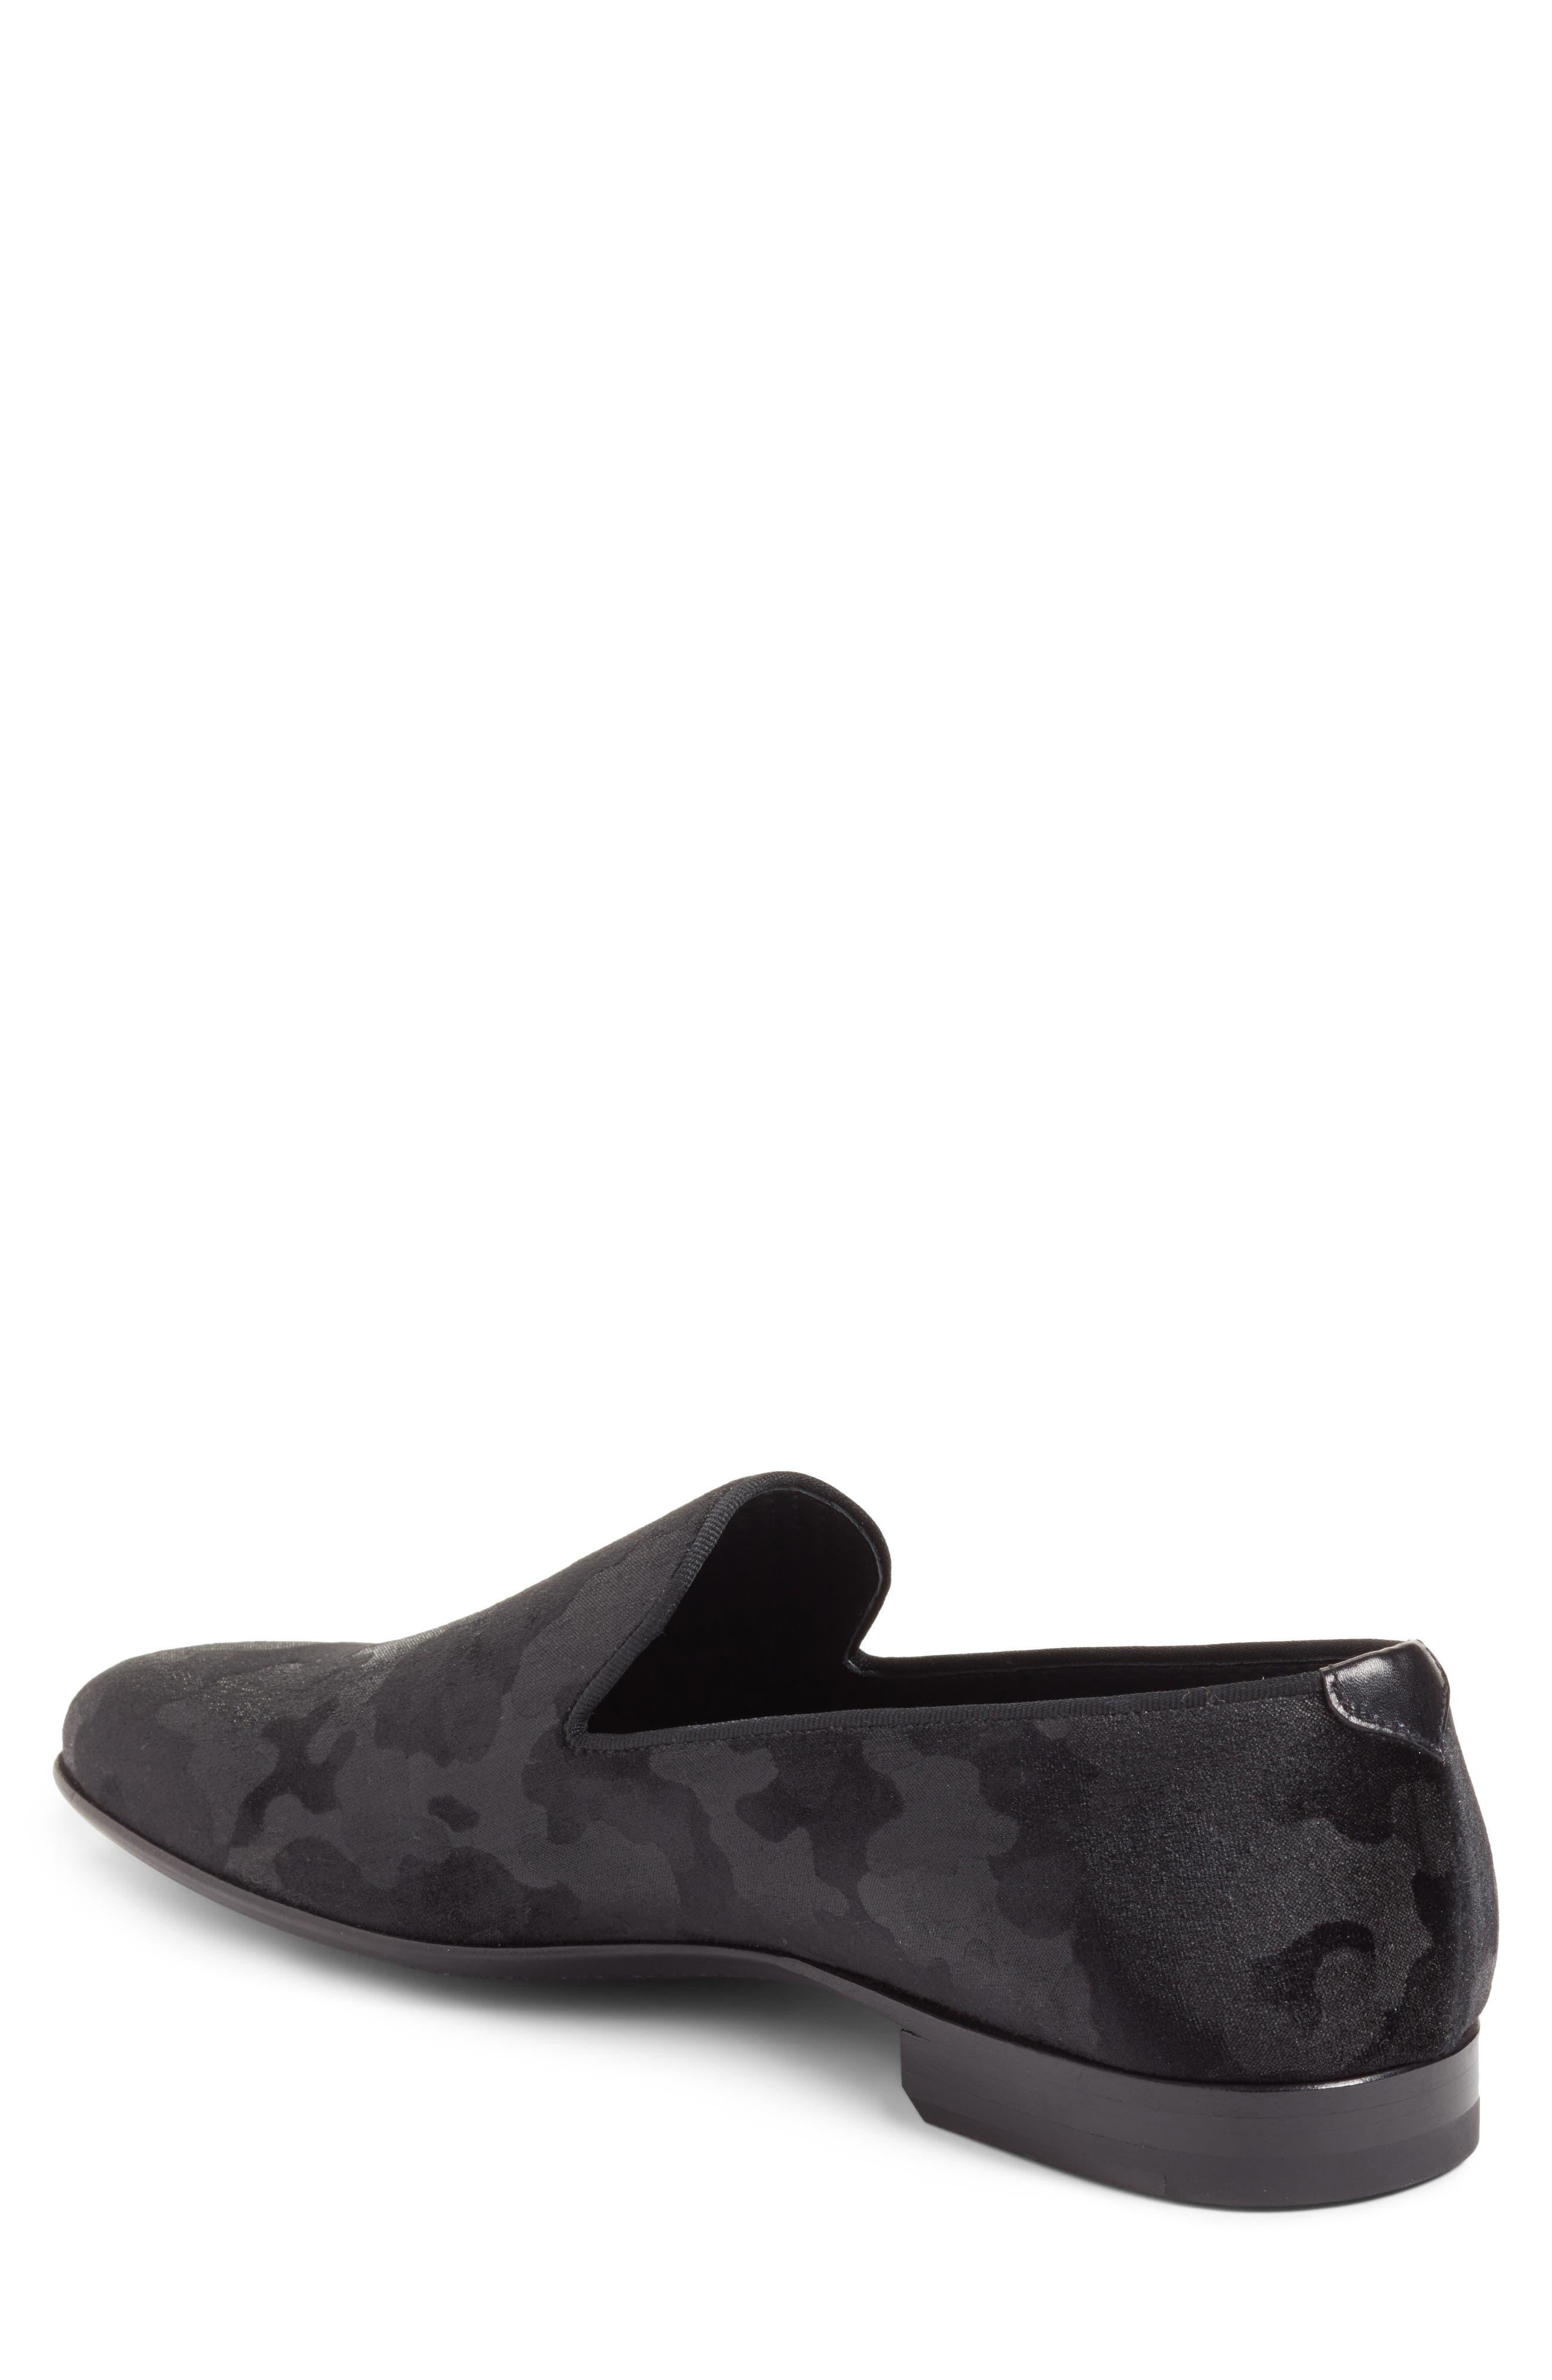 Delano Venetian Loafer,                             Alternate thumbnail 2, color,                             Black Camo